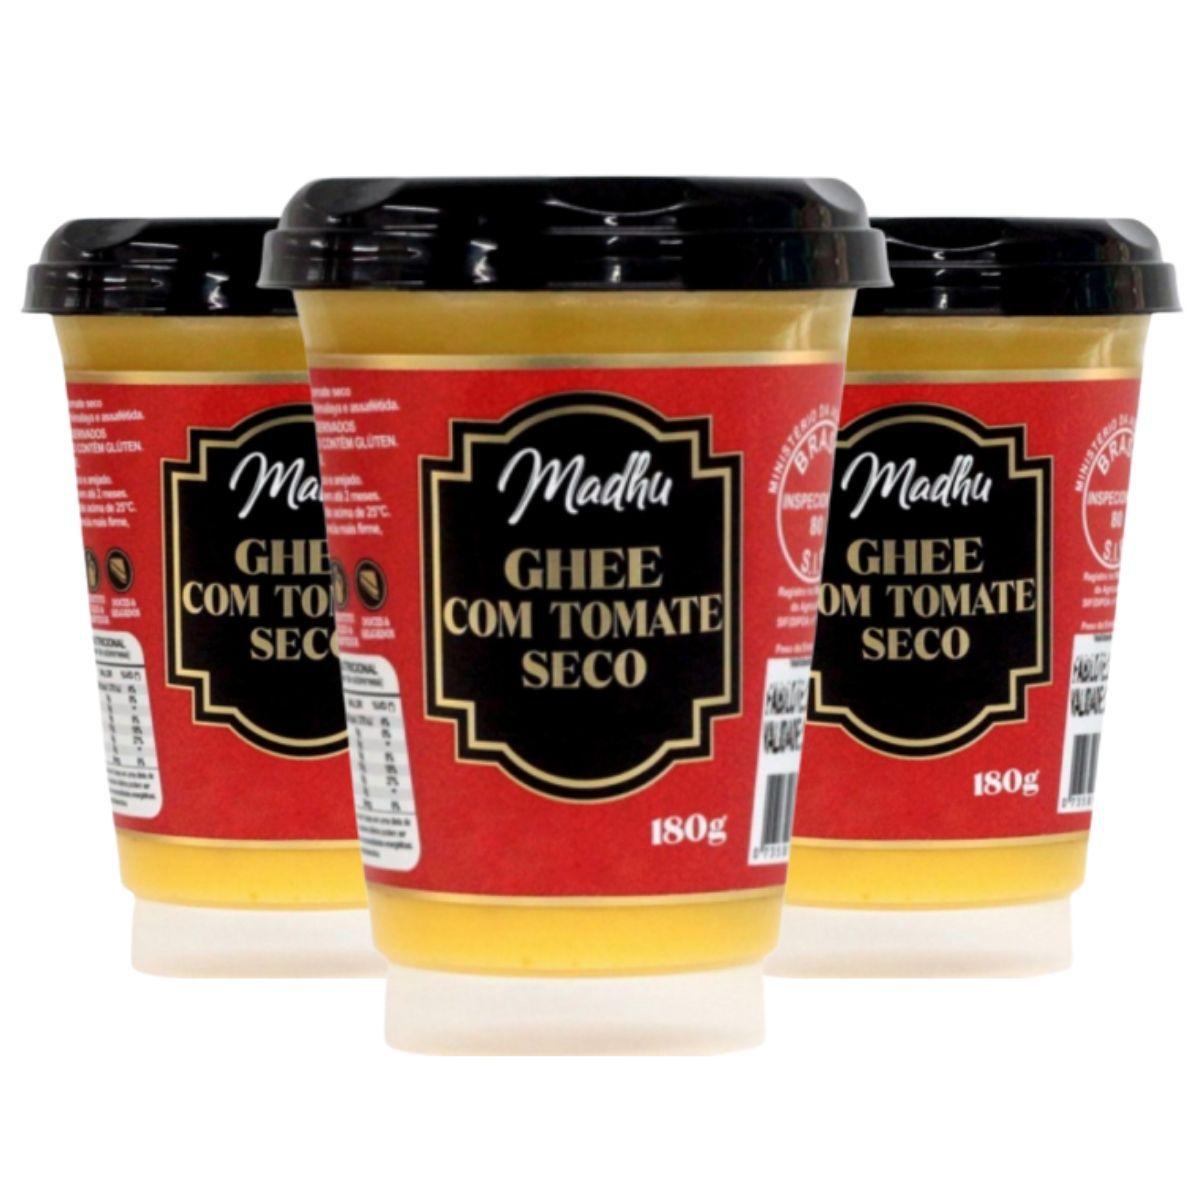 Kit 3 Manteigas Ghee C/ Tomate Seco Clarificada 180g - Madhu Bakery